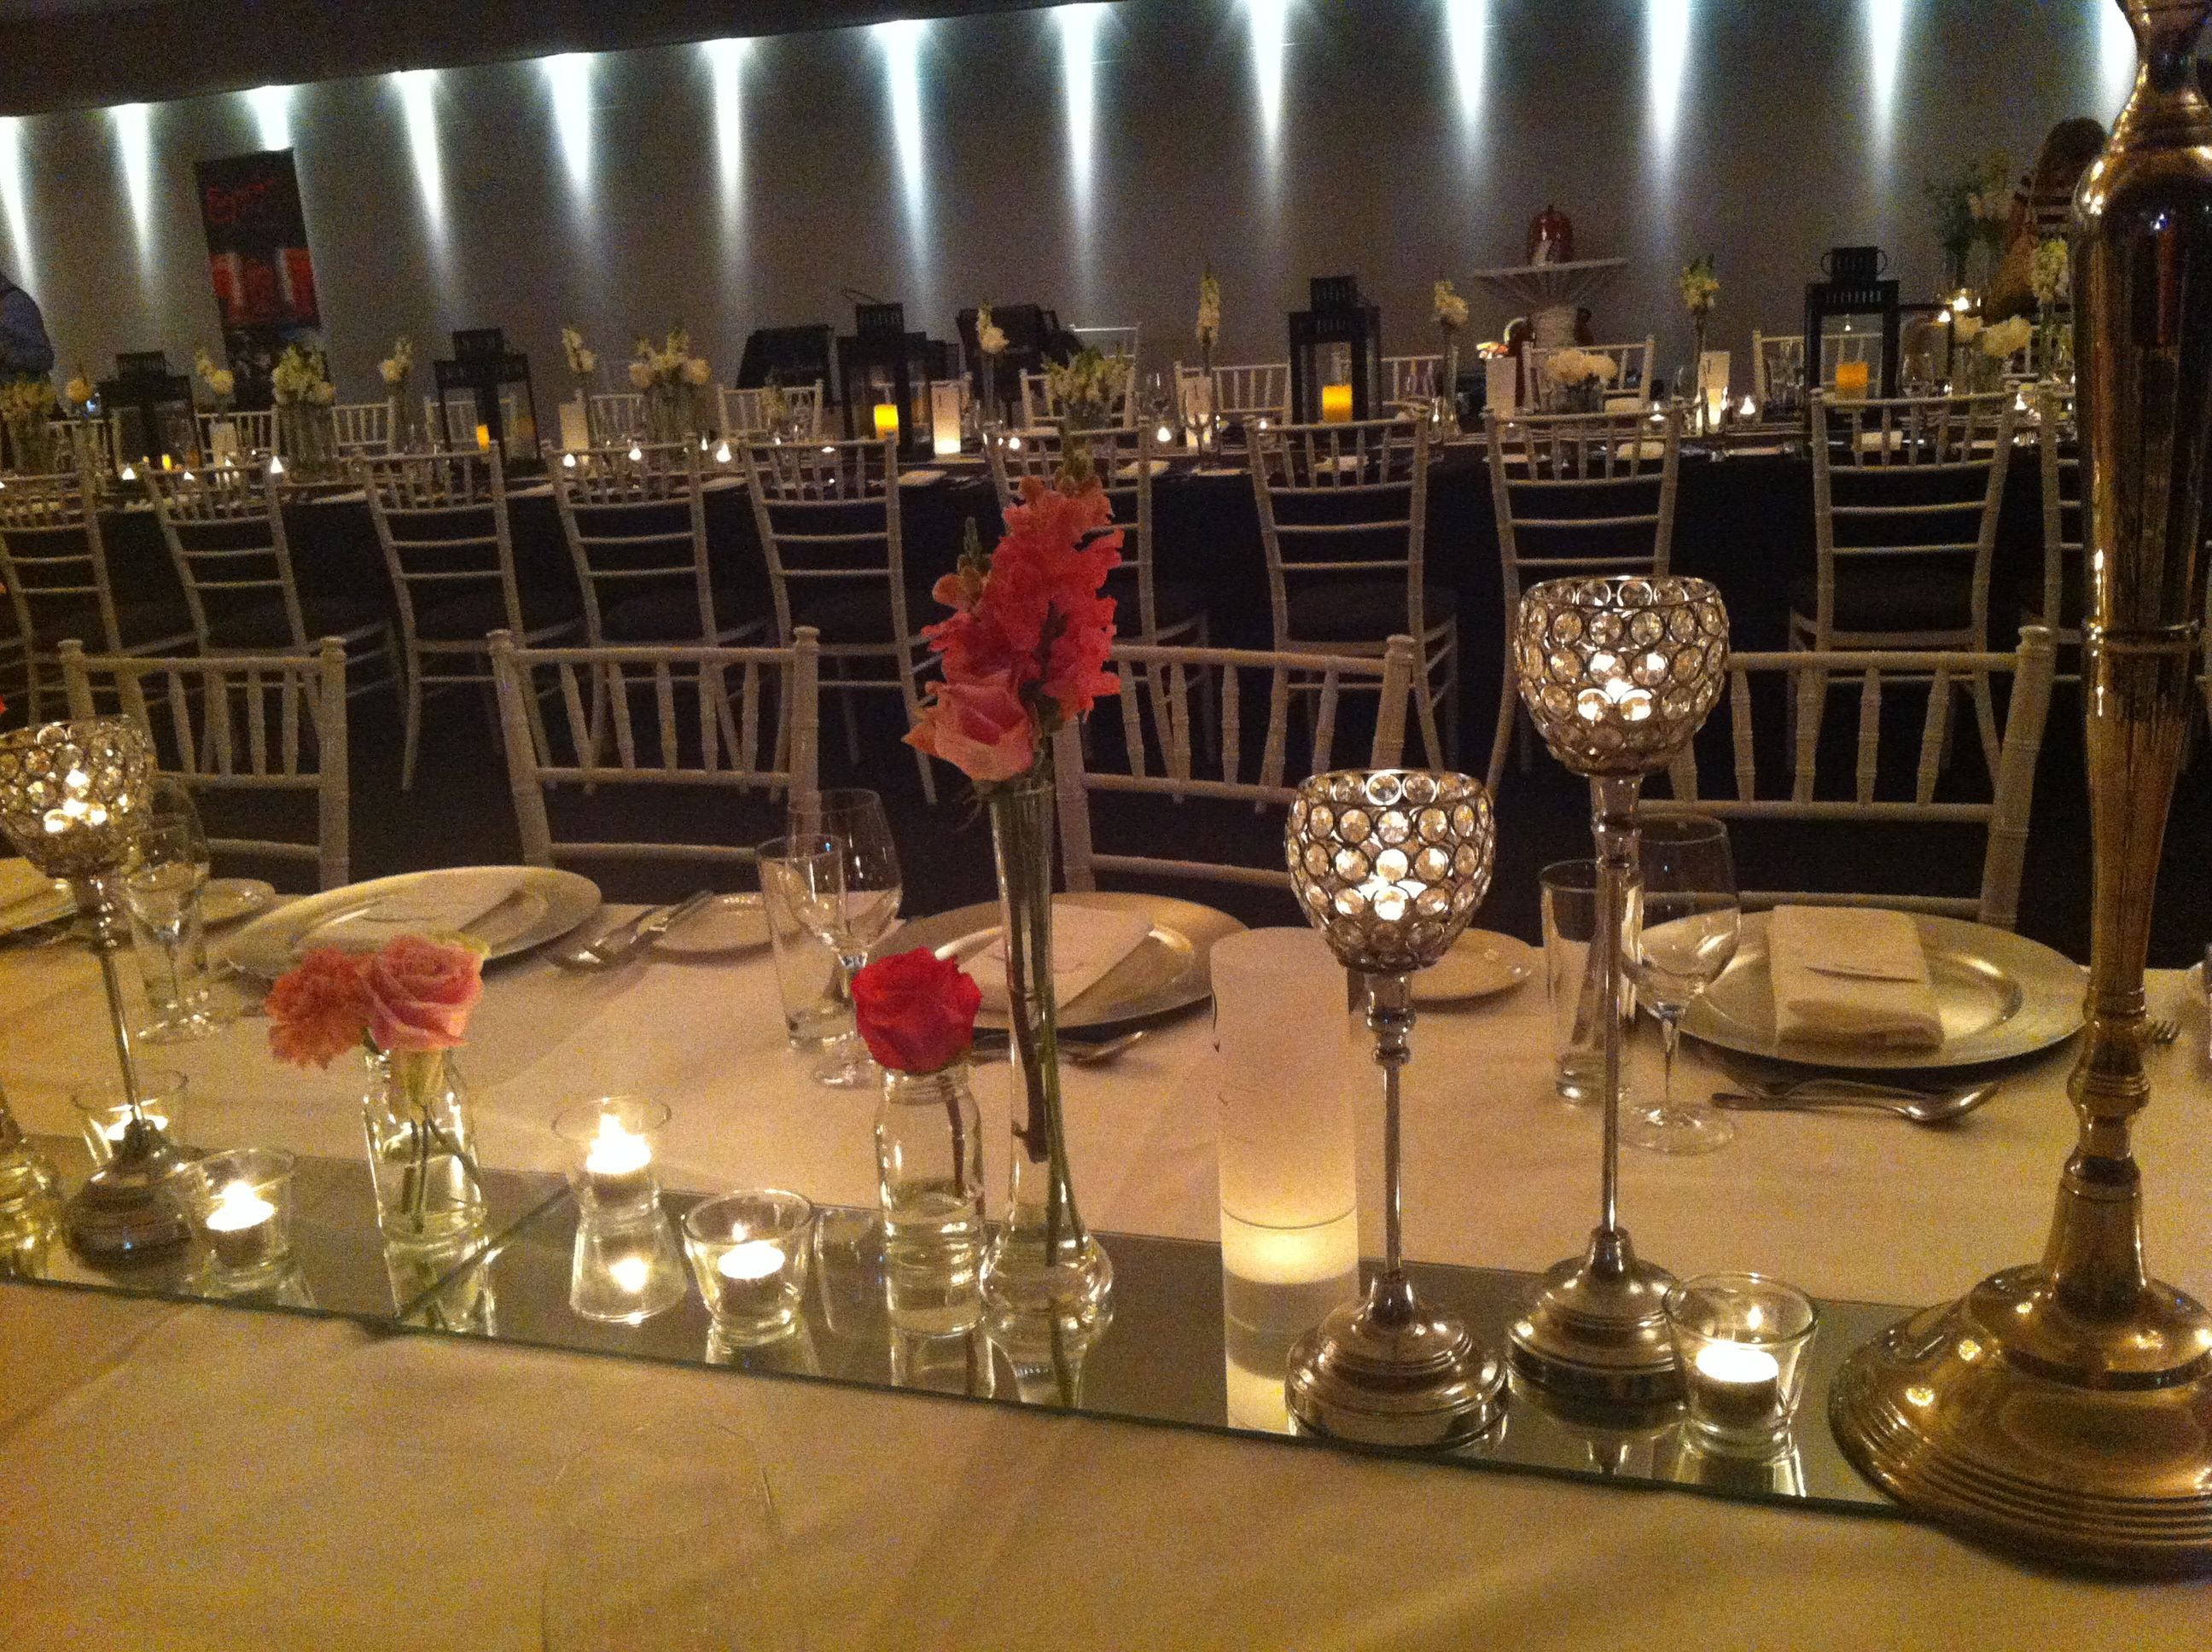 Mirror Tiles For Table Decorations Custom Table Deco Ideas Mirror Tiles Crystal Globes Tea Light Candles Design Inspiration